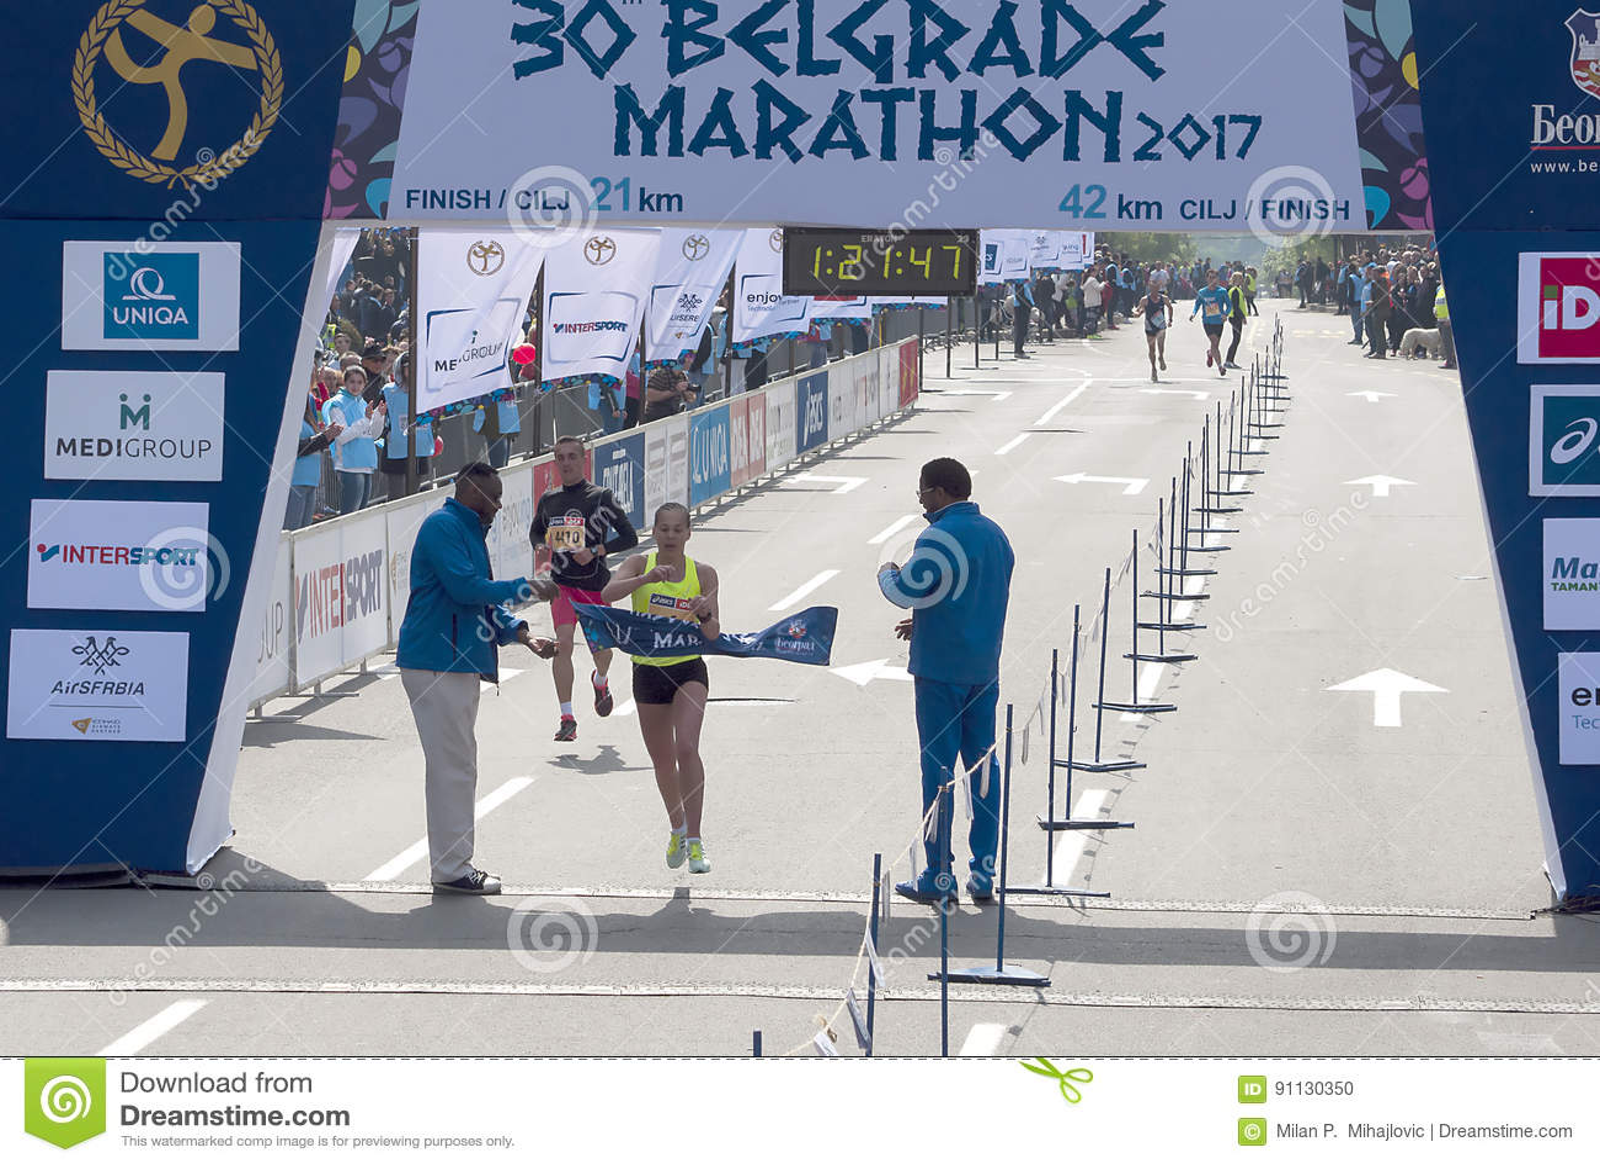 Winner of the half marathon for woman